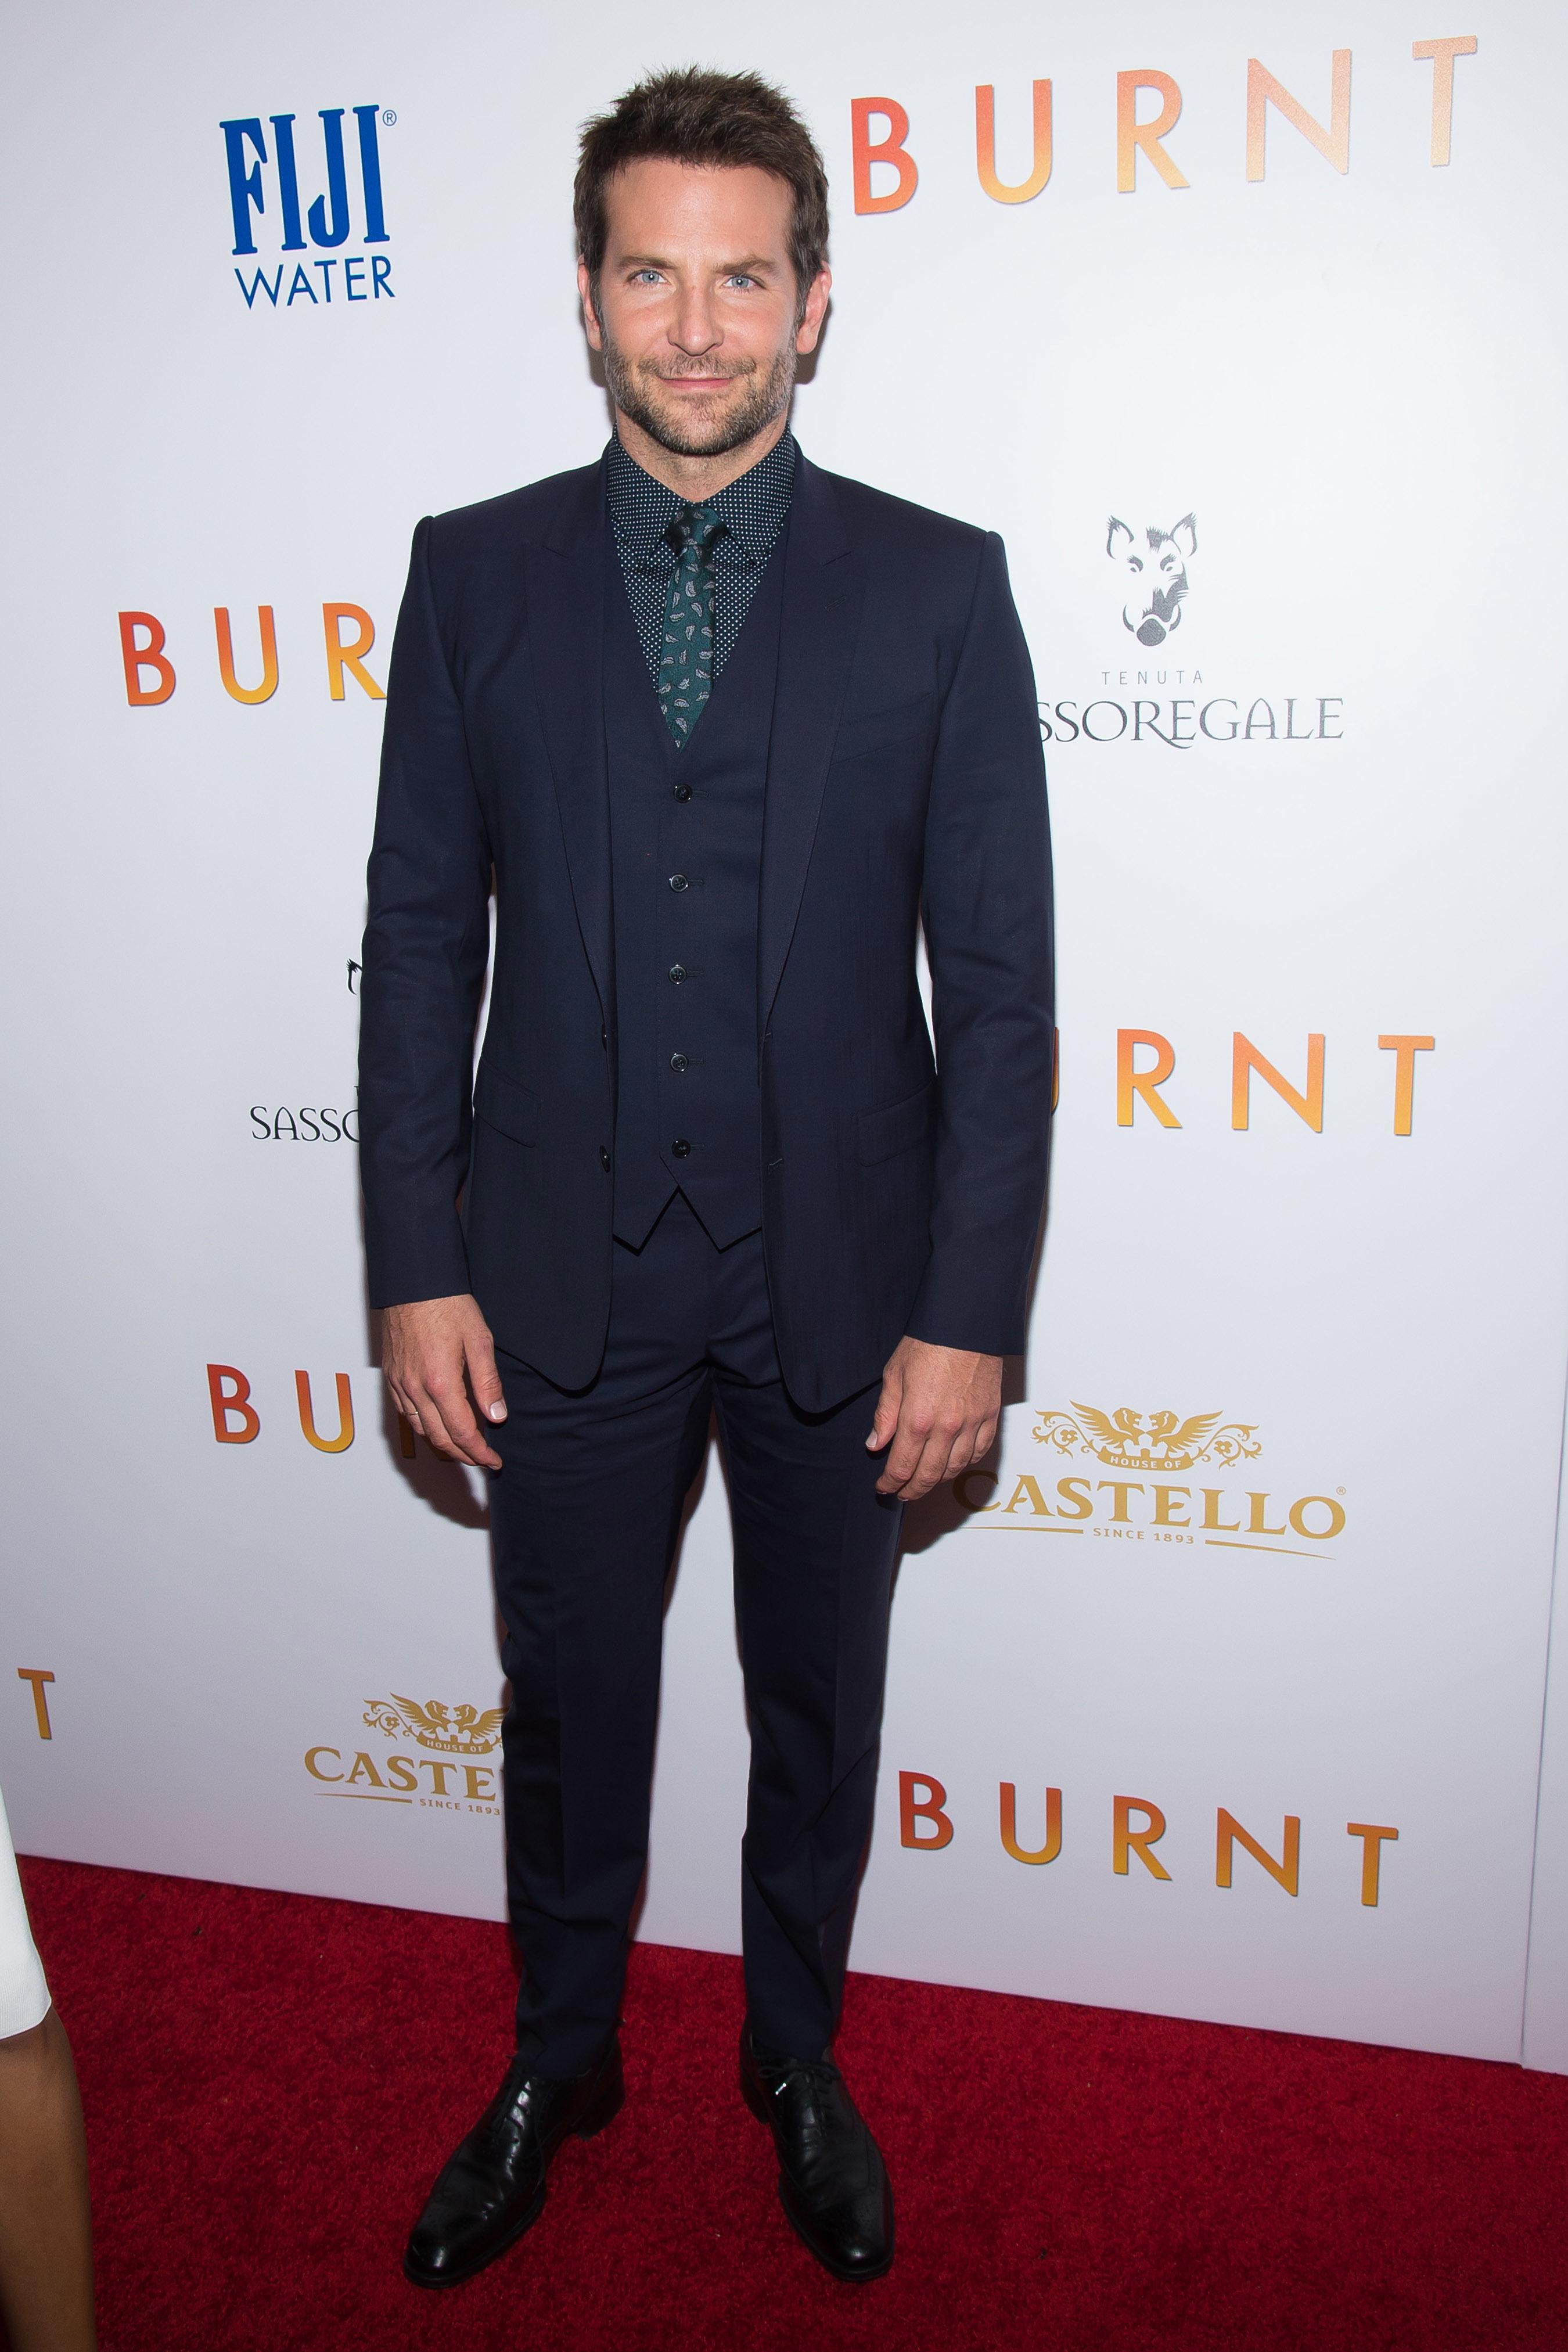 Barbara Walters flirts shamelessly with Bradley Cooper